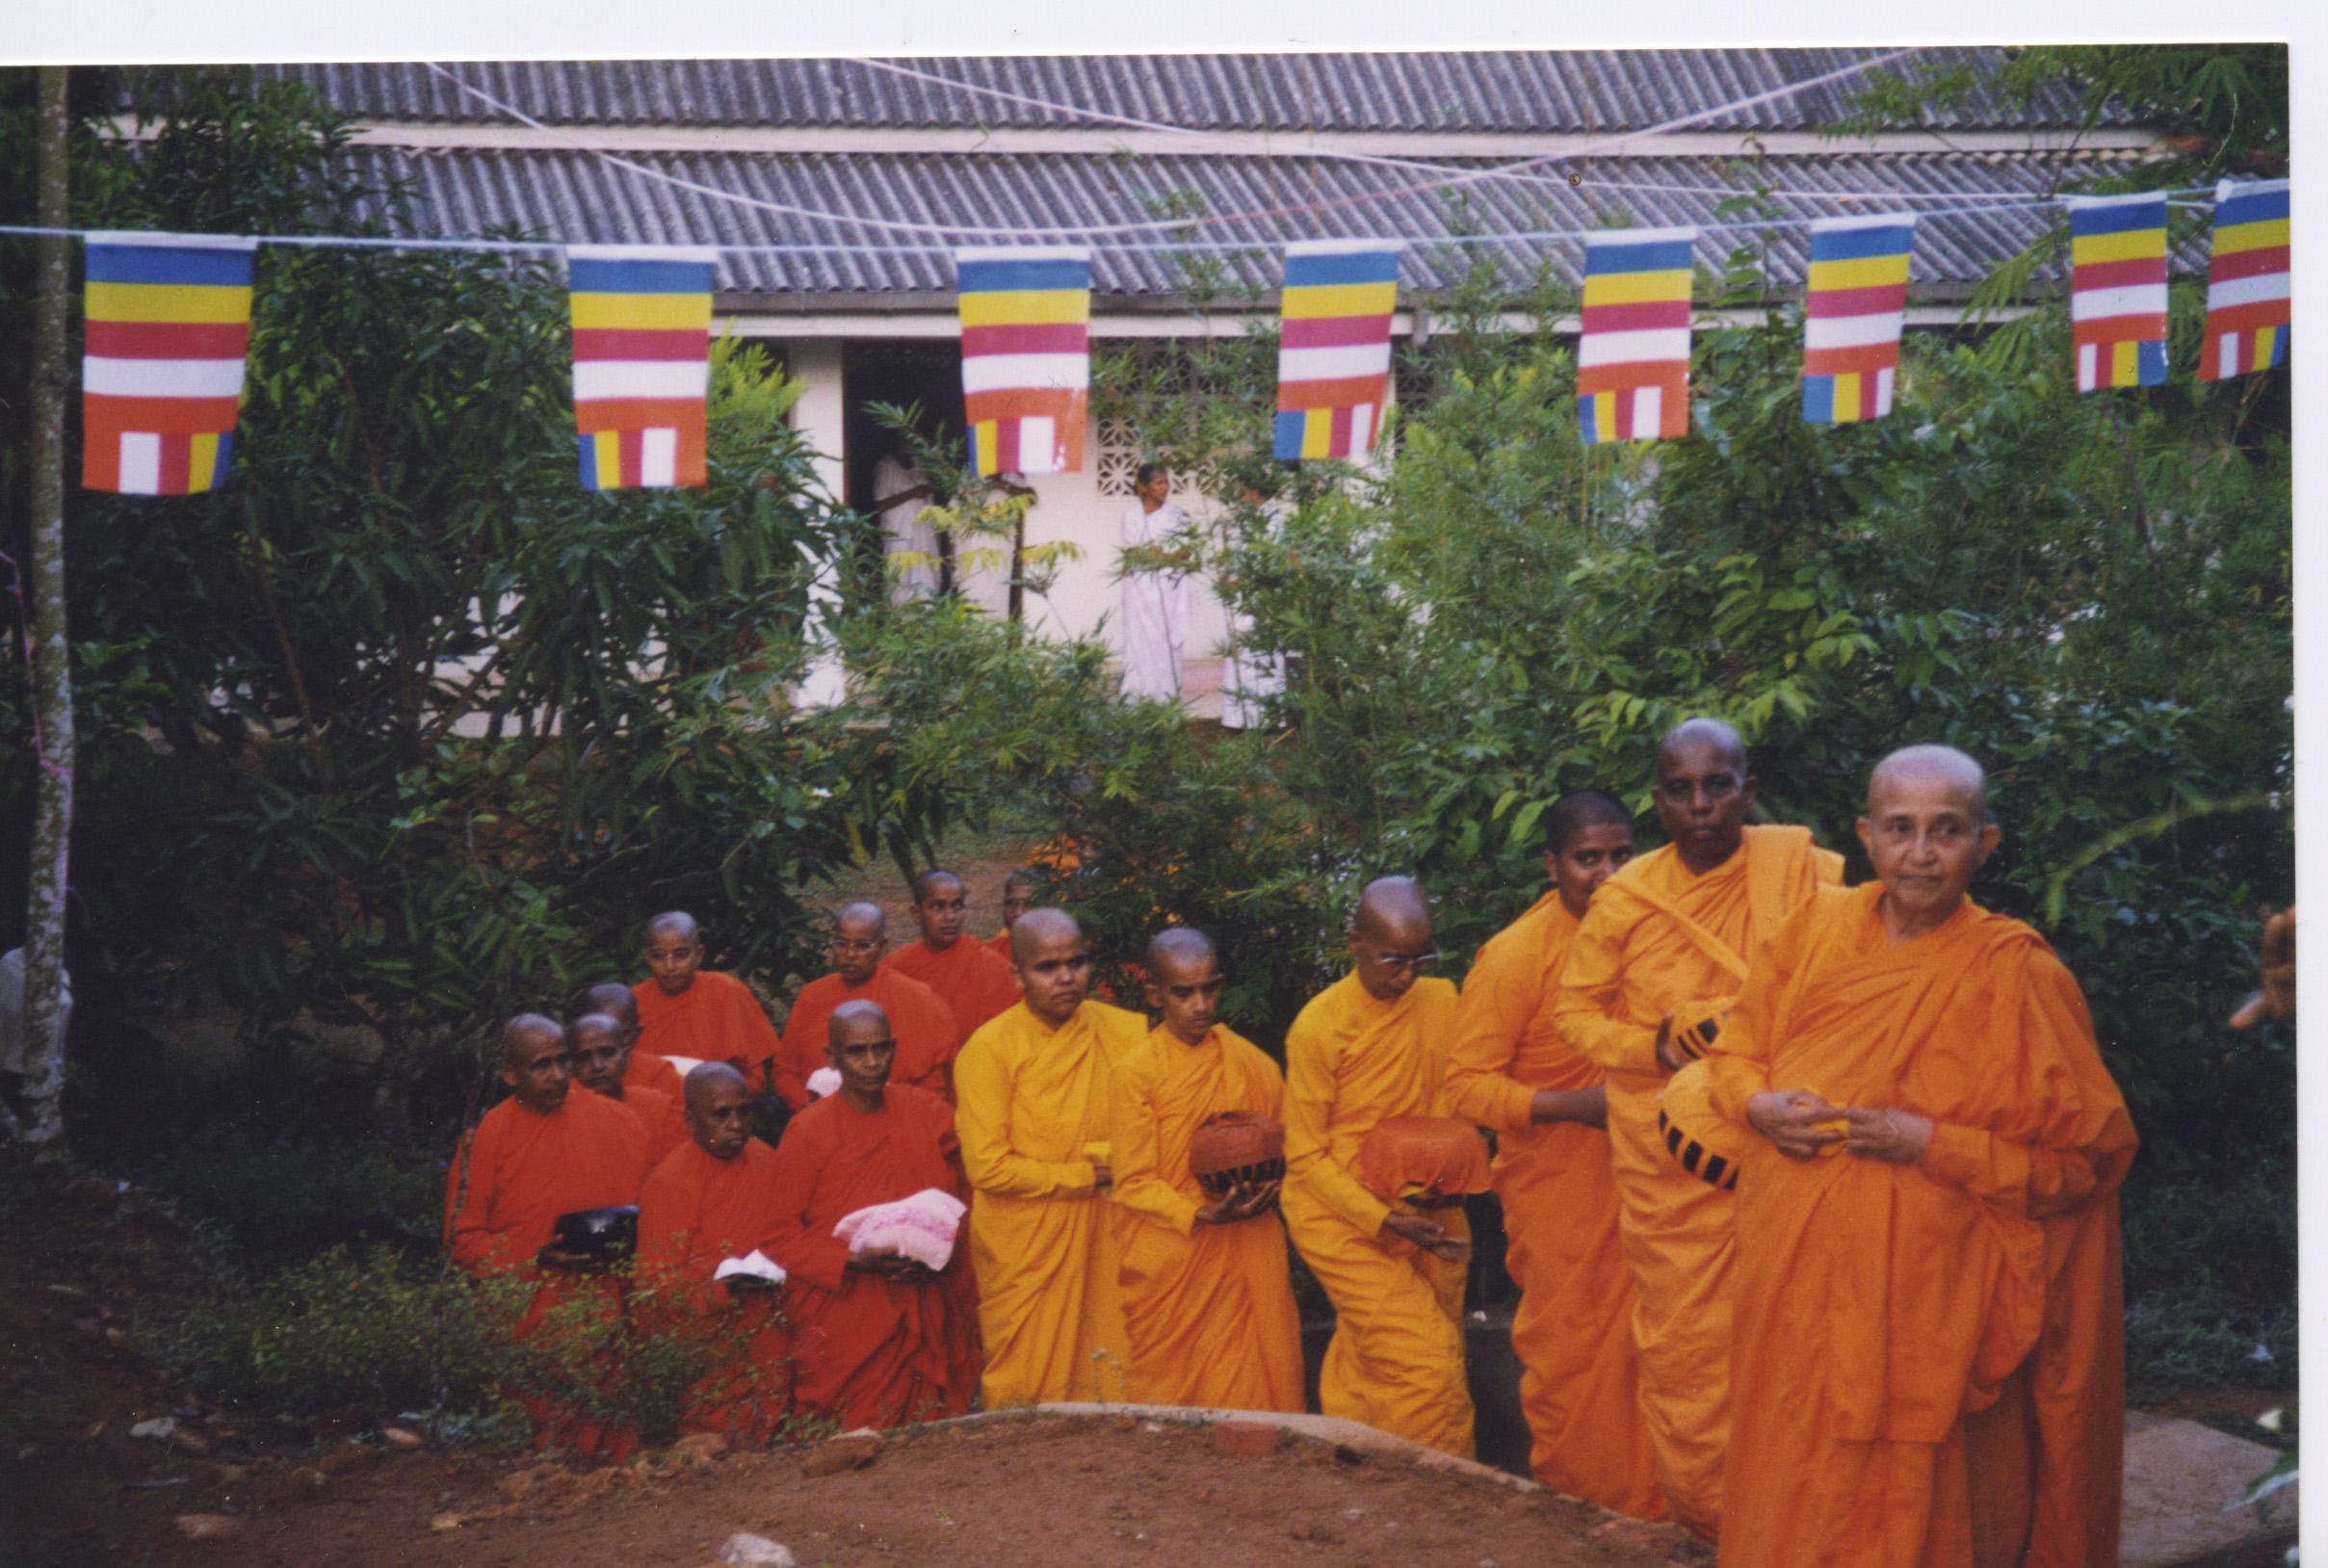 Buddhist nuns and monks, Sri Lanka